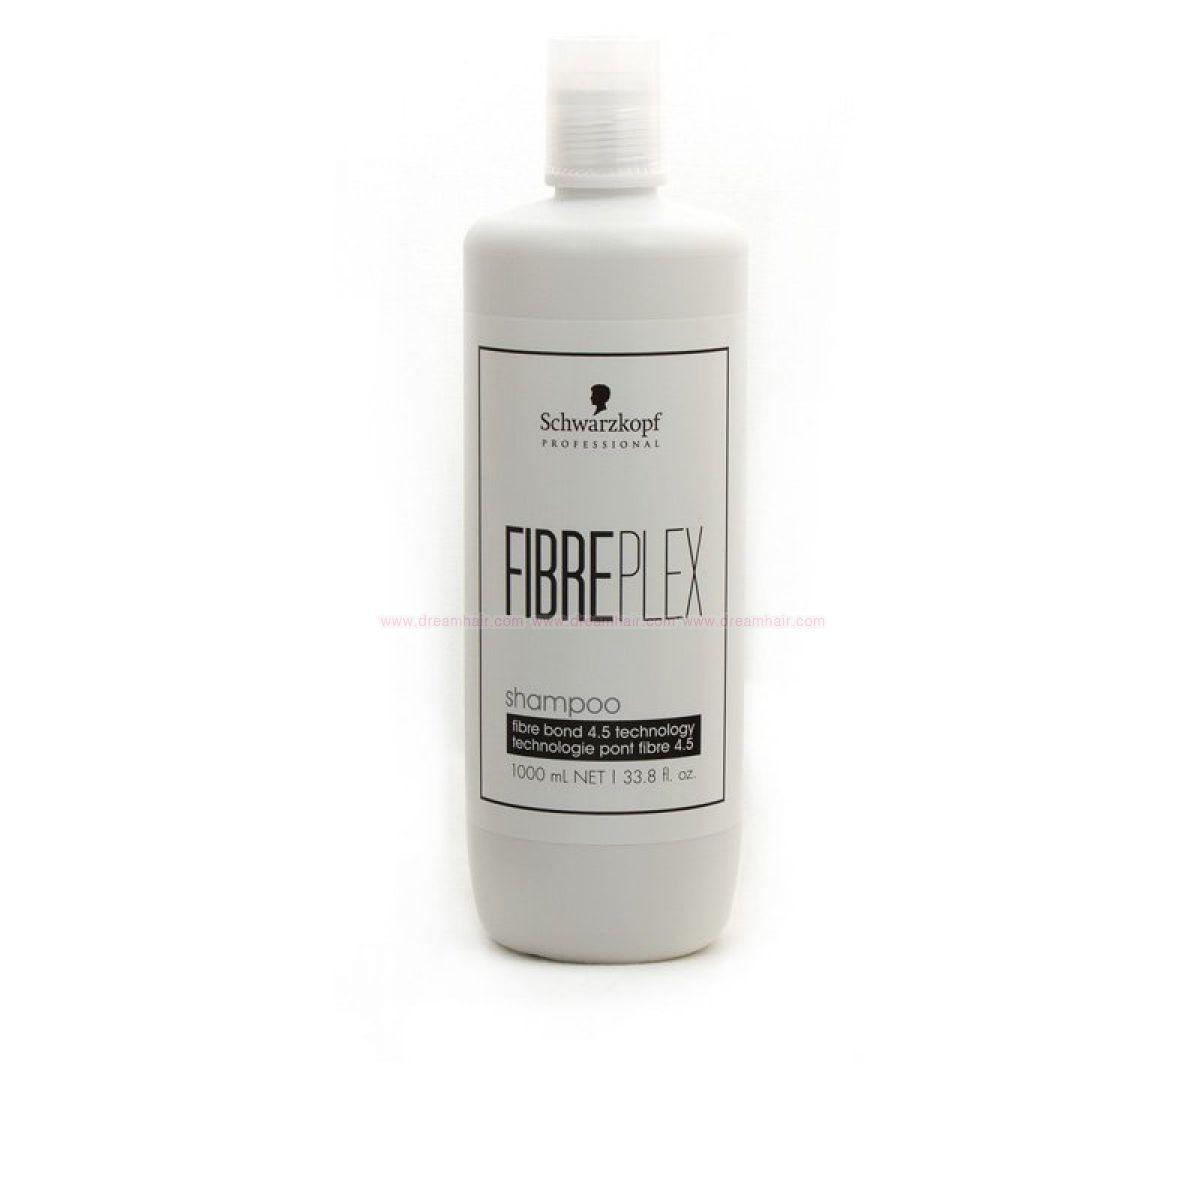 Schwarzkopf Fibreplex Shampoo 1000ml - Repairing Shampoo - Shampoo ... 757ee936c5827